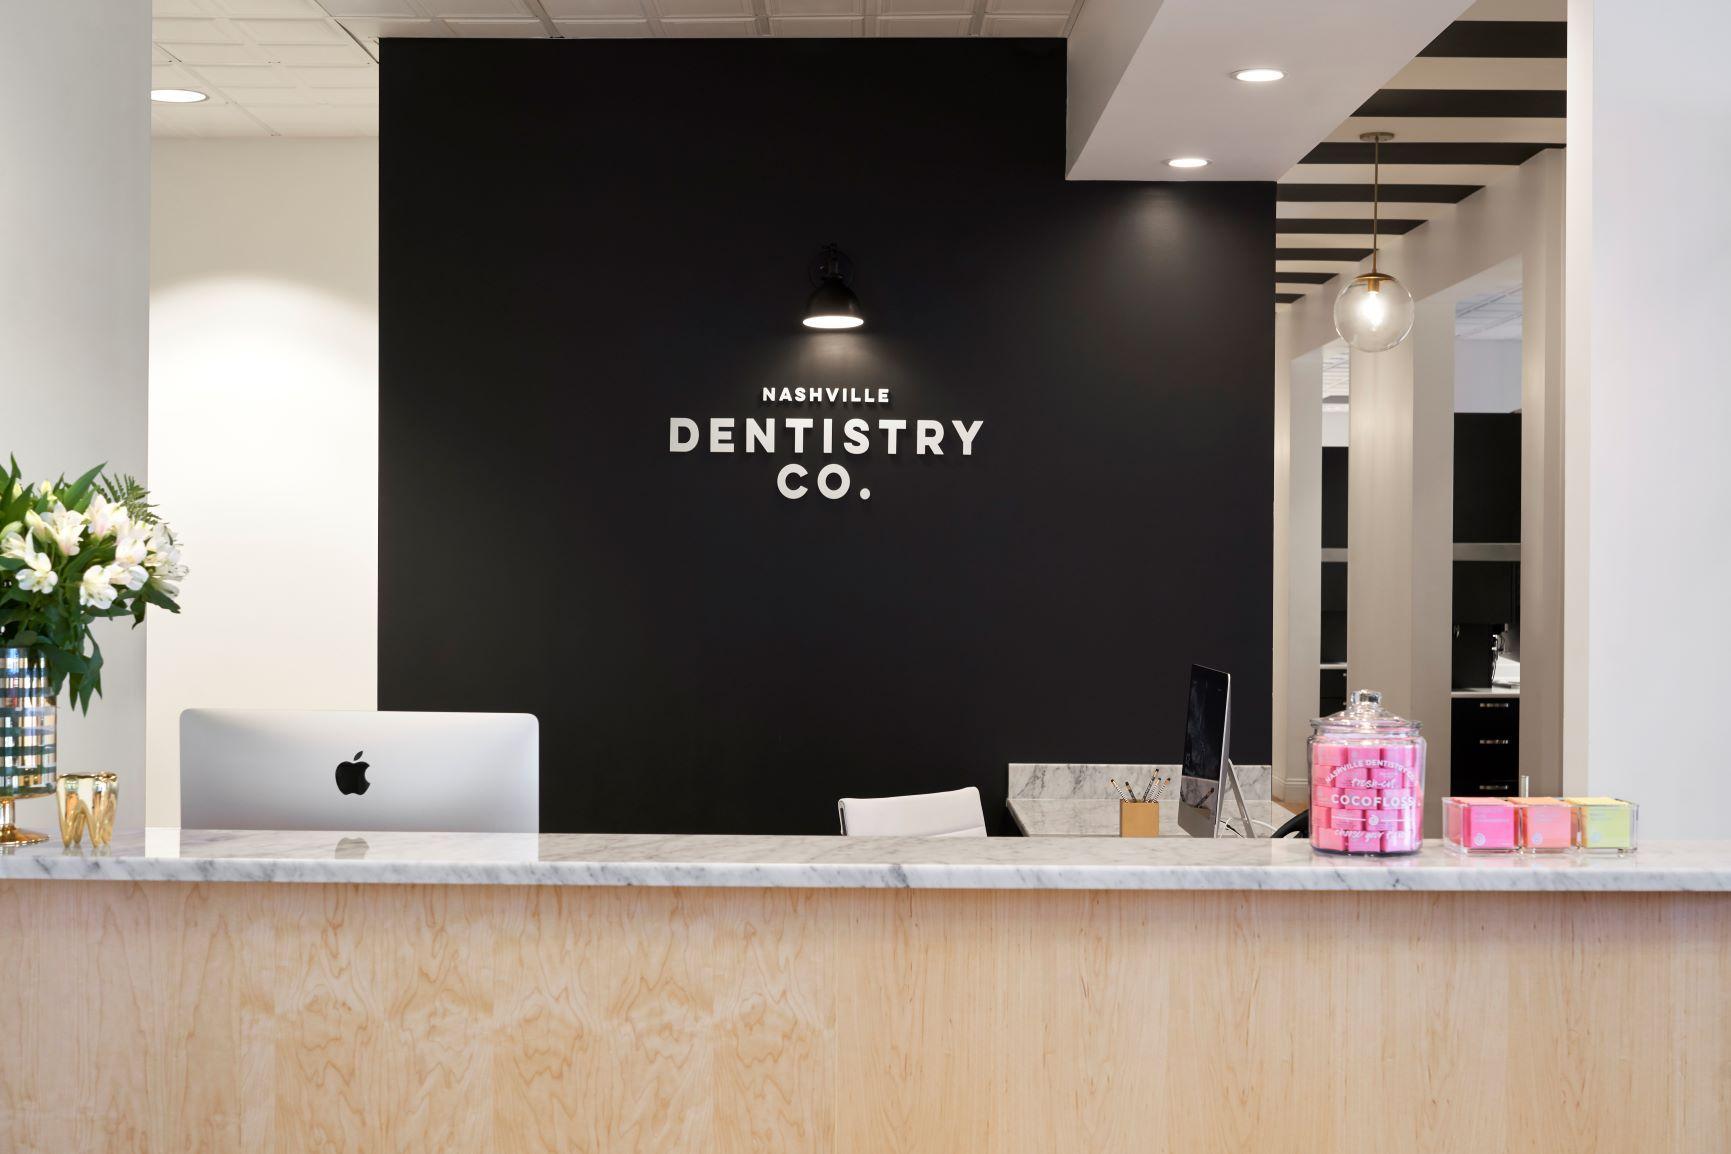 Dental Office Design Competition Dental Office Design Receptions